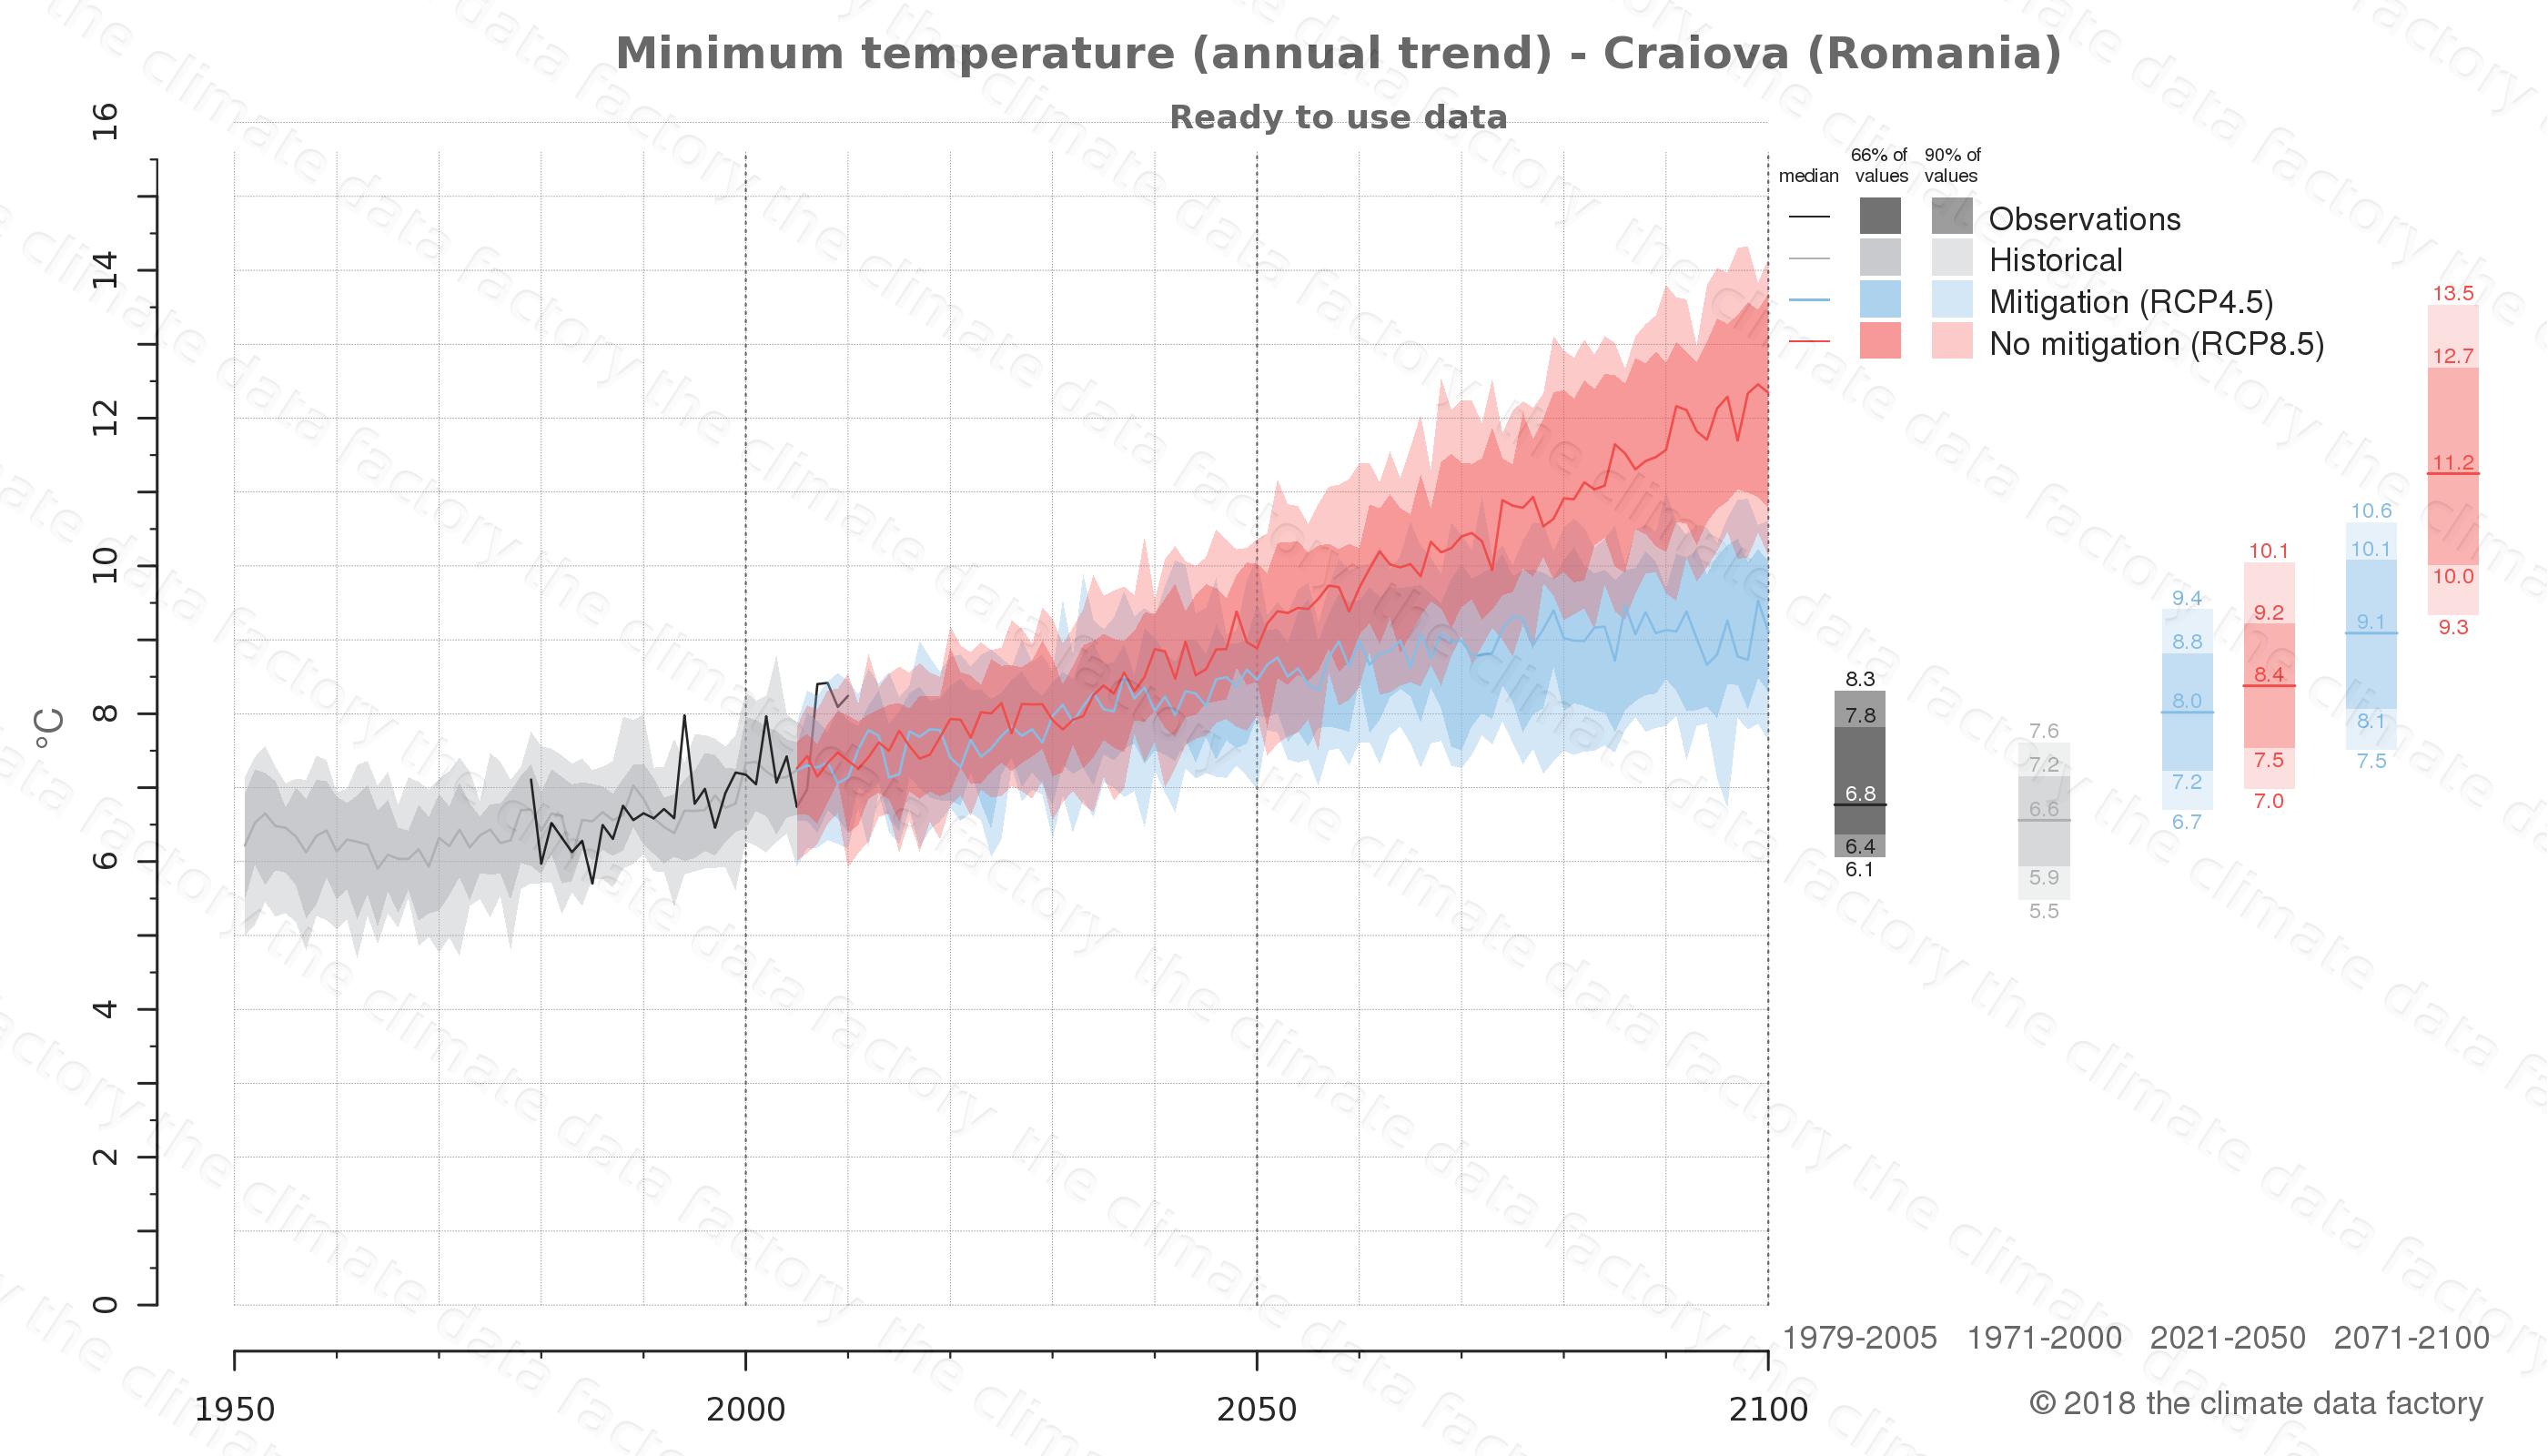 climate change data policy adaptation climate graph city data minimum-temperature craiova romania